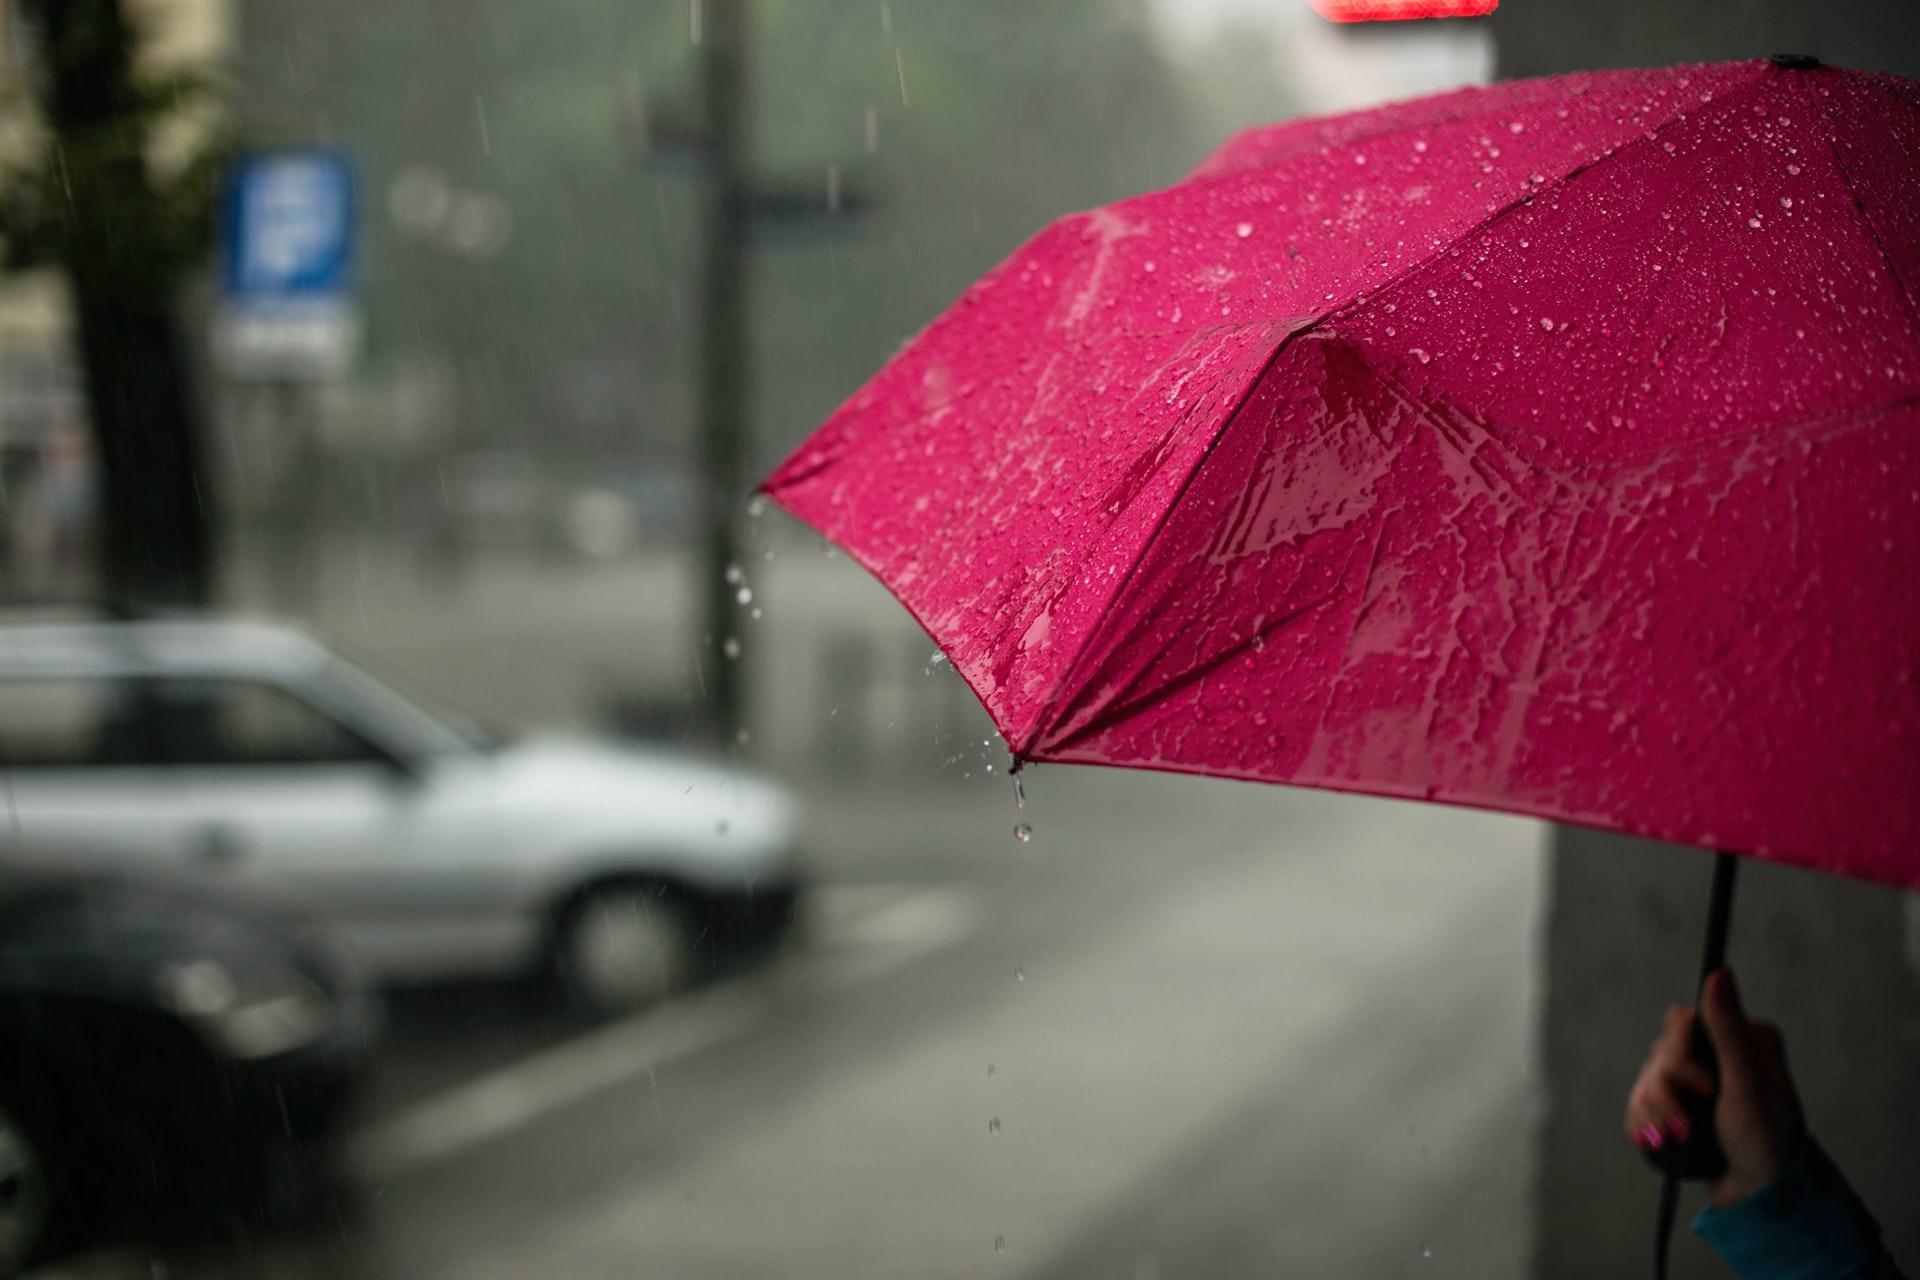 Hoe bescherm je je huis tegen hevige regen?